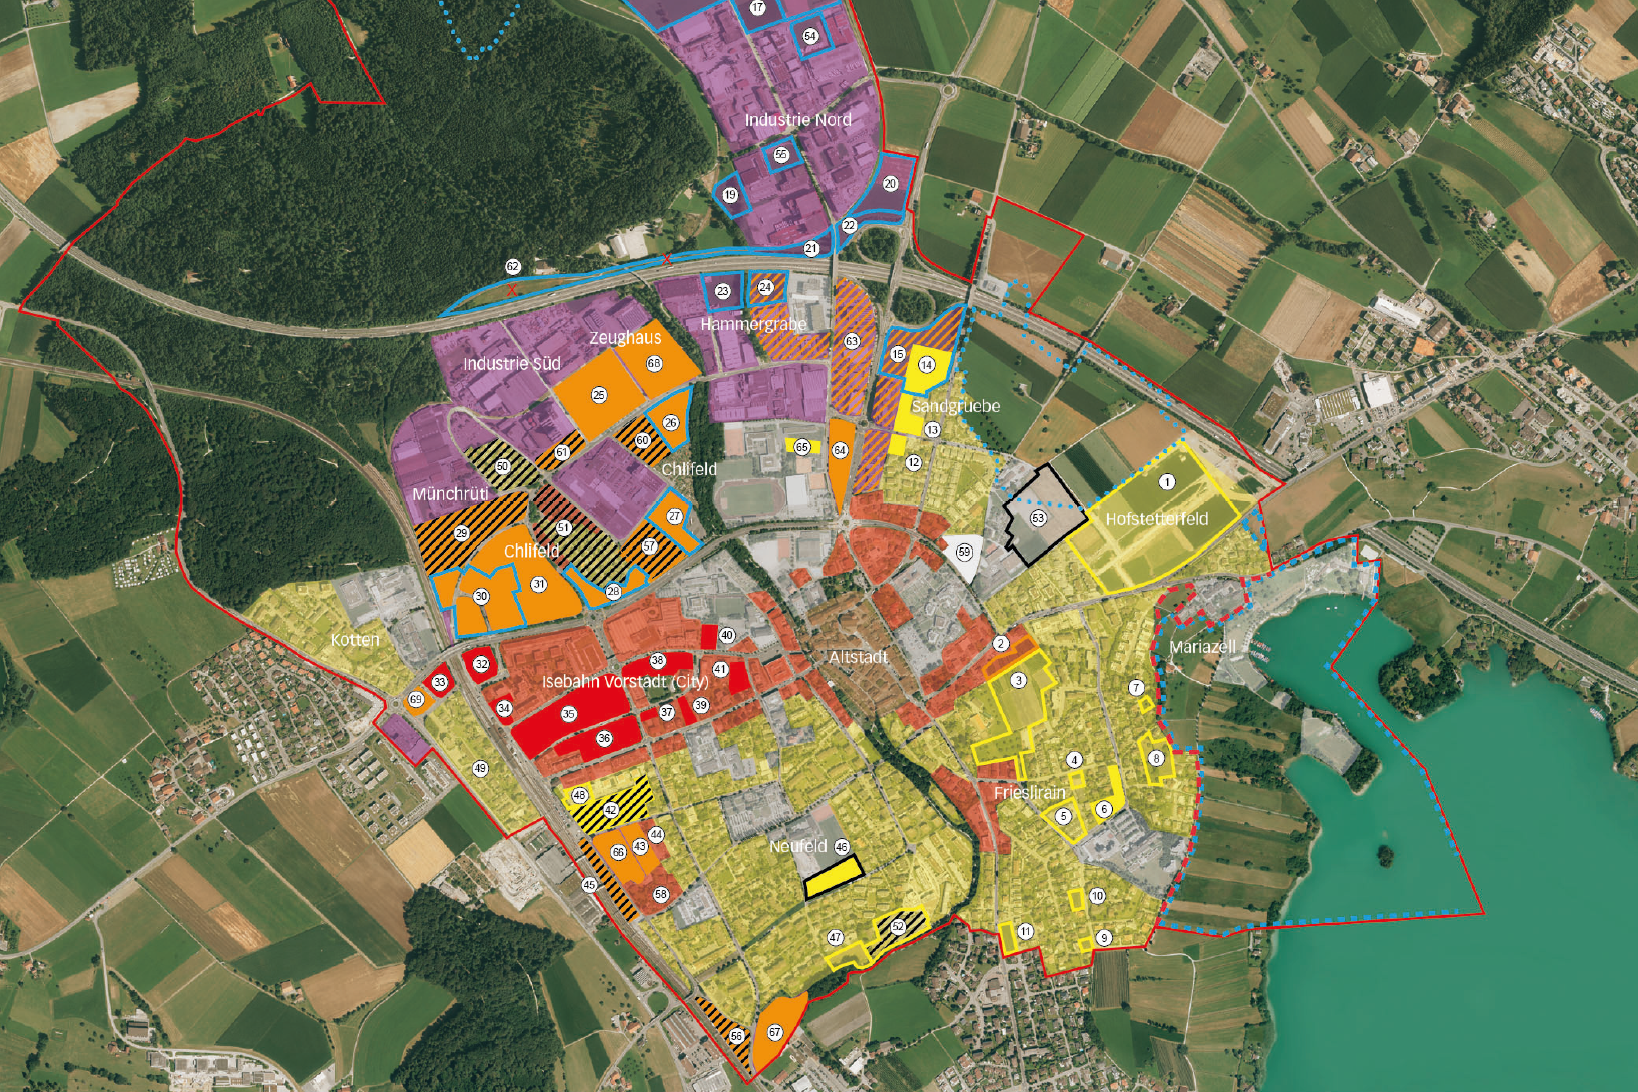 Preview image for LOM object Actionbound Sursee Raumplanung Nutzungen - Ausserschulisches Lernen